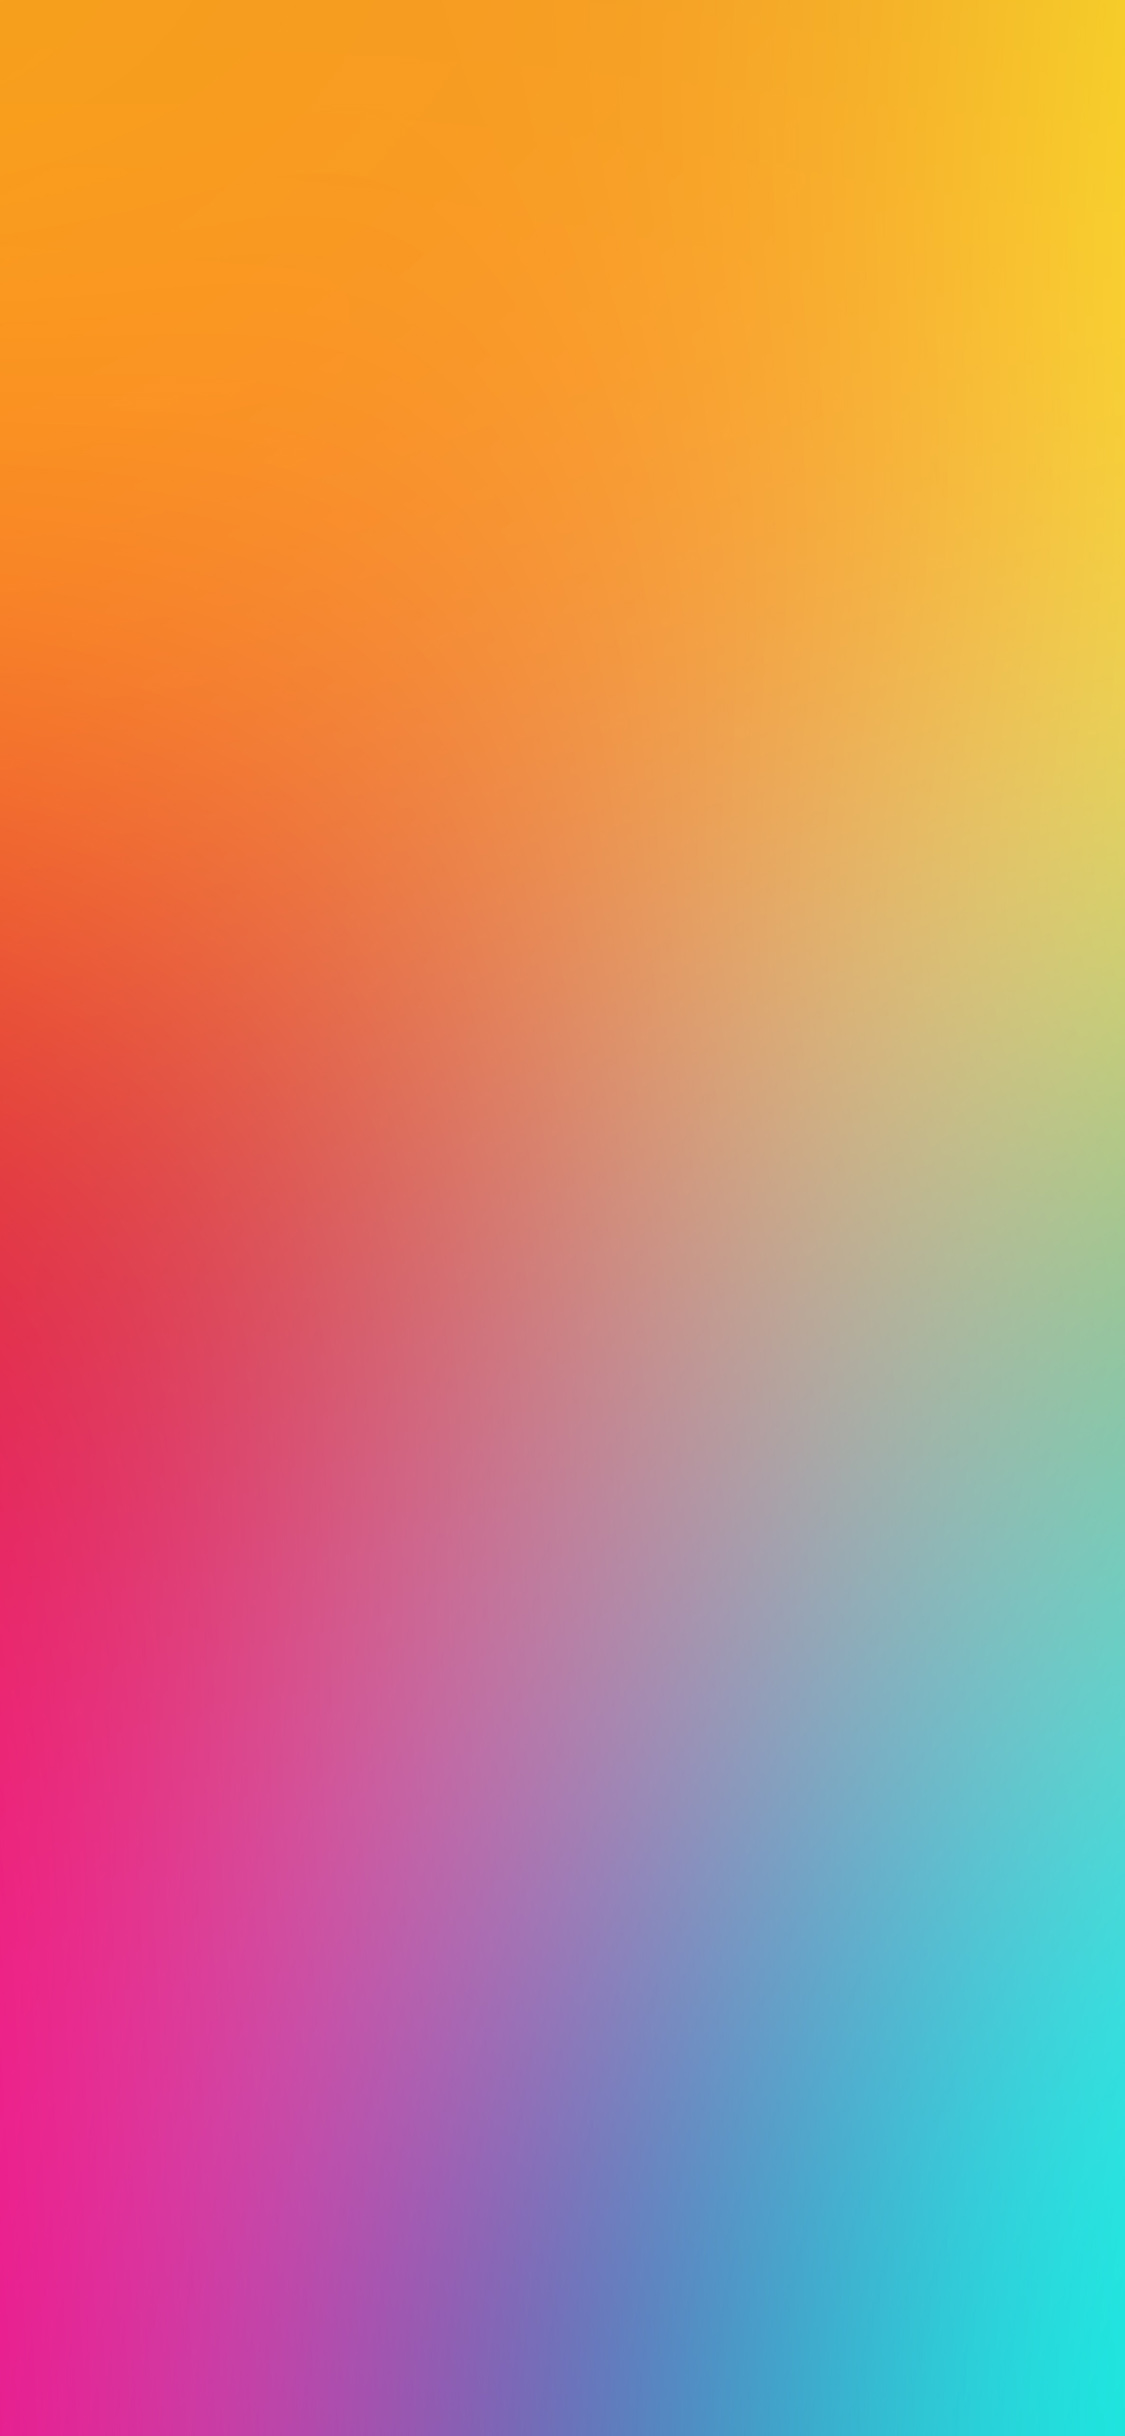 Ios 11 Iphone X Wallpaper Iphone